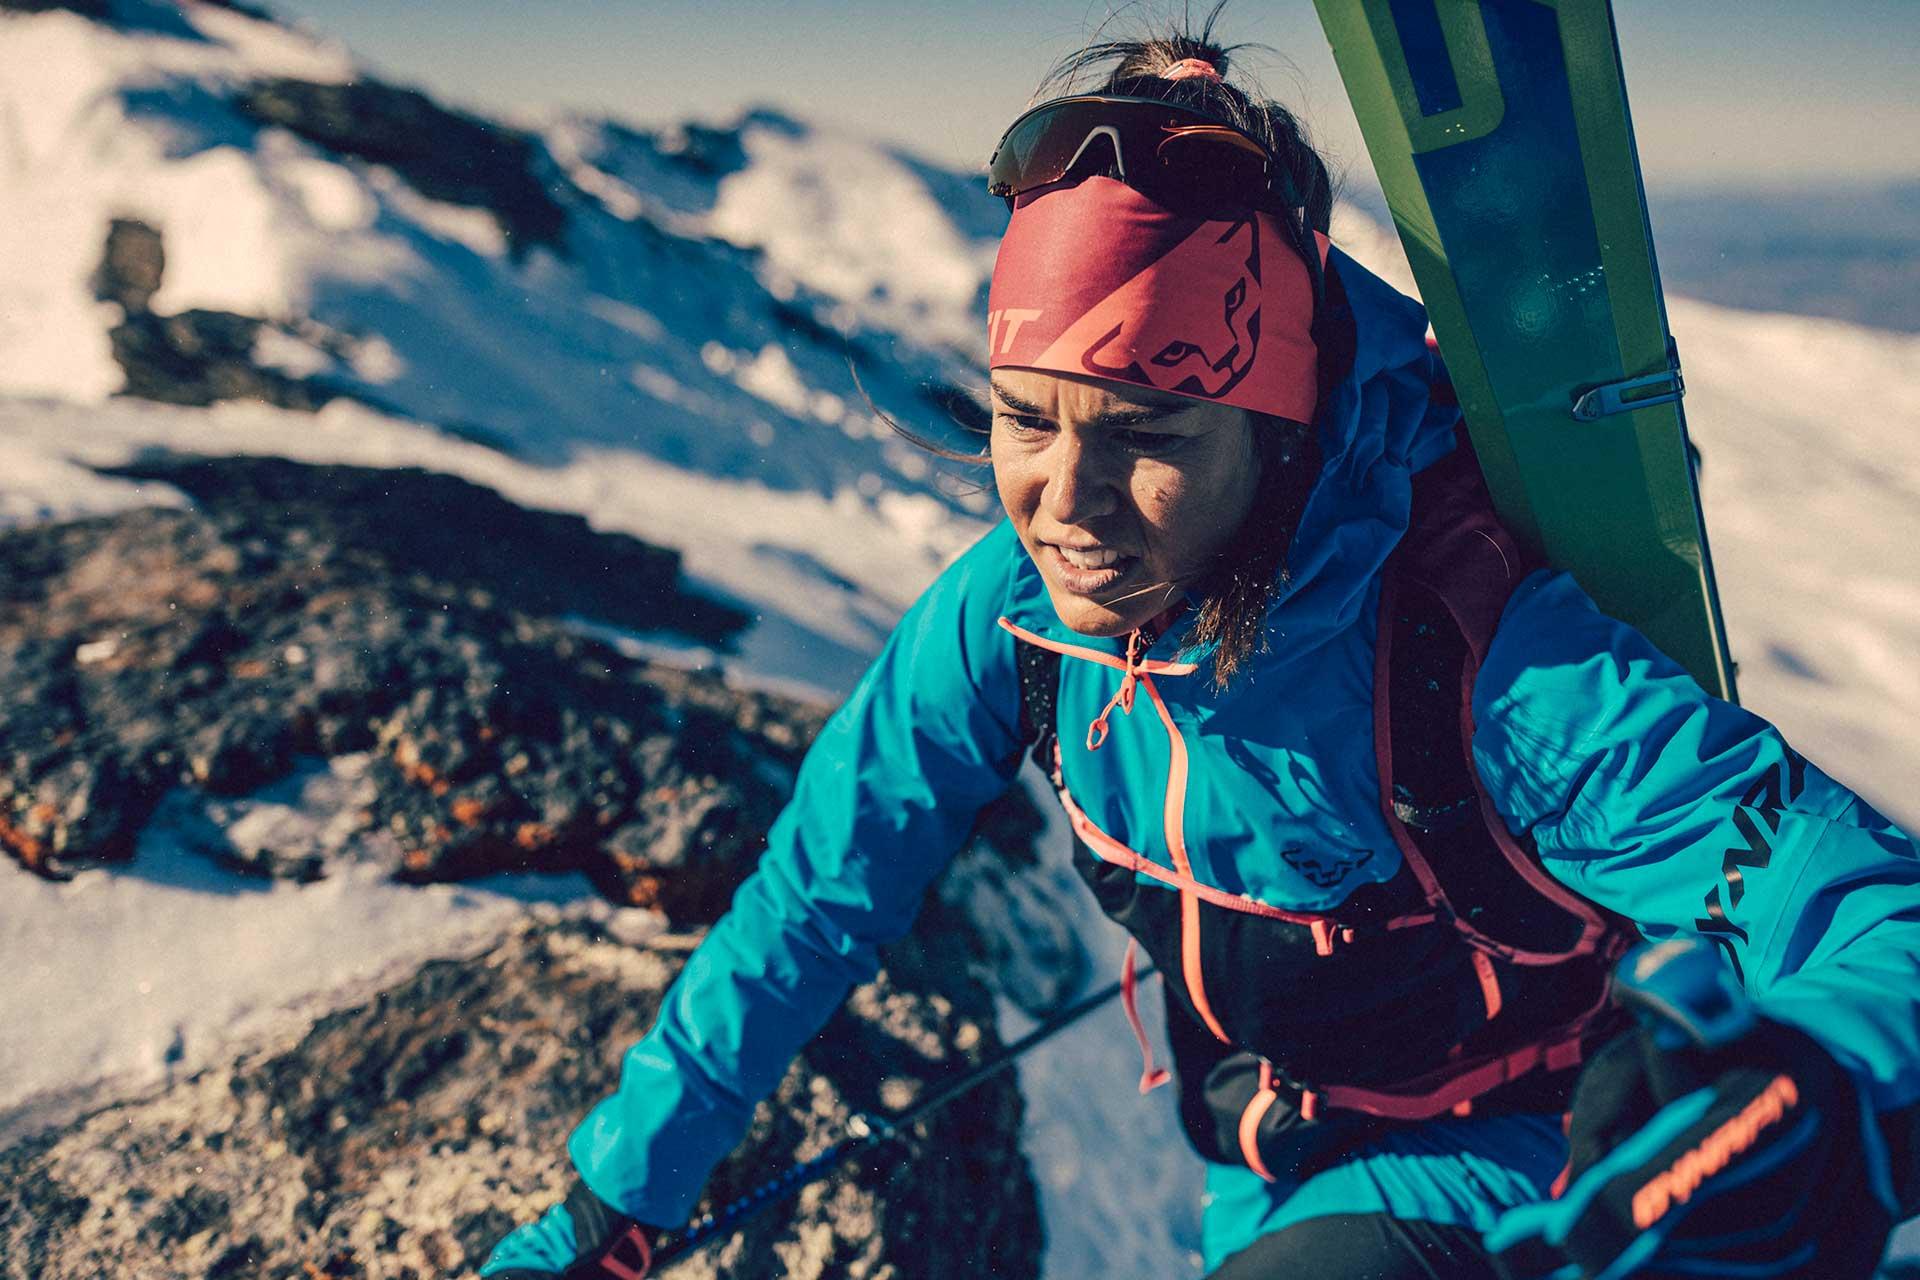 Skitour Fotograf Michael Müller Alpin Dynafit Fotoproduktion Outdoor